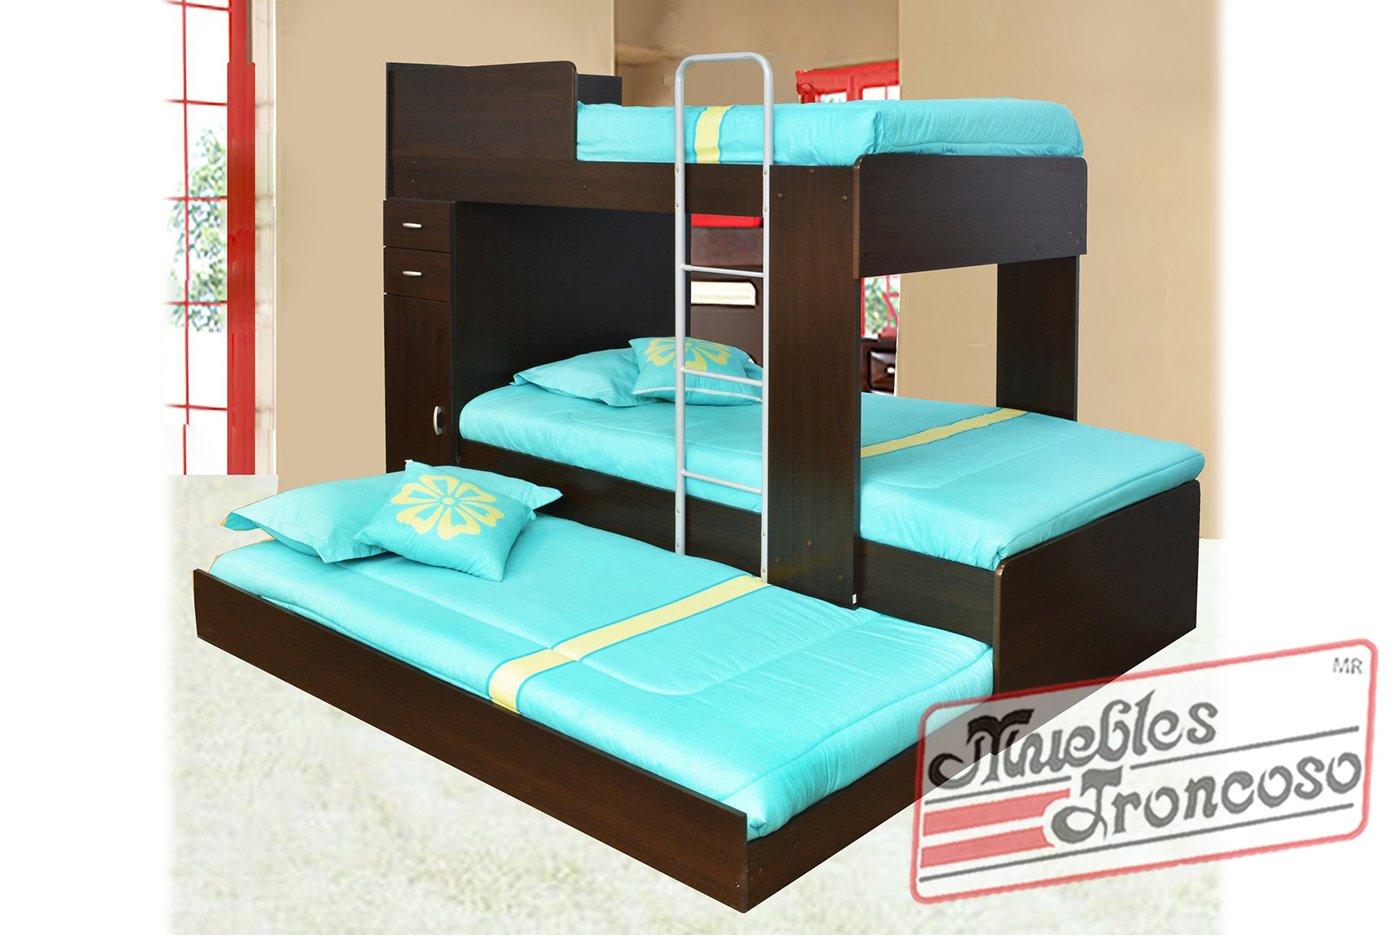 Muebles Troncoso: Litera 340 Chocolate